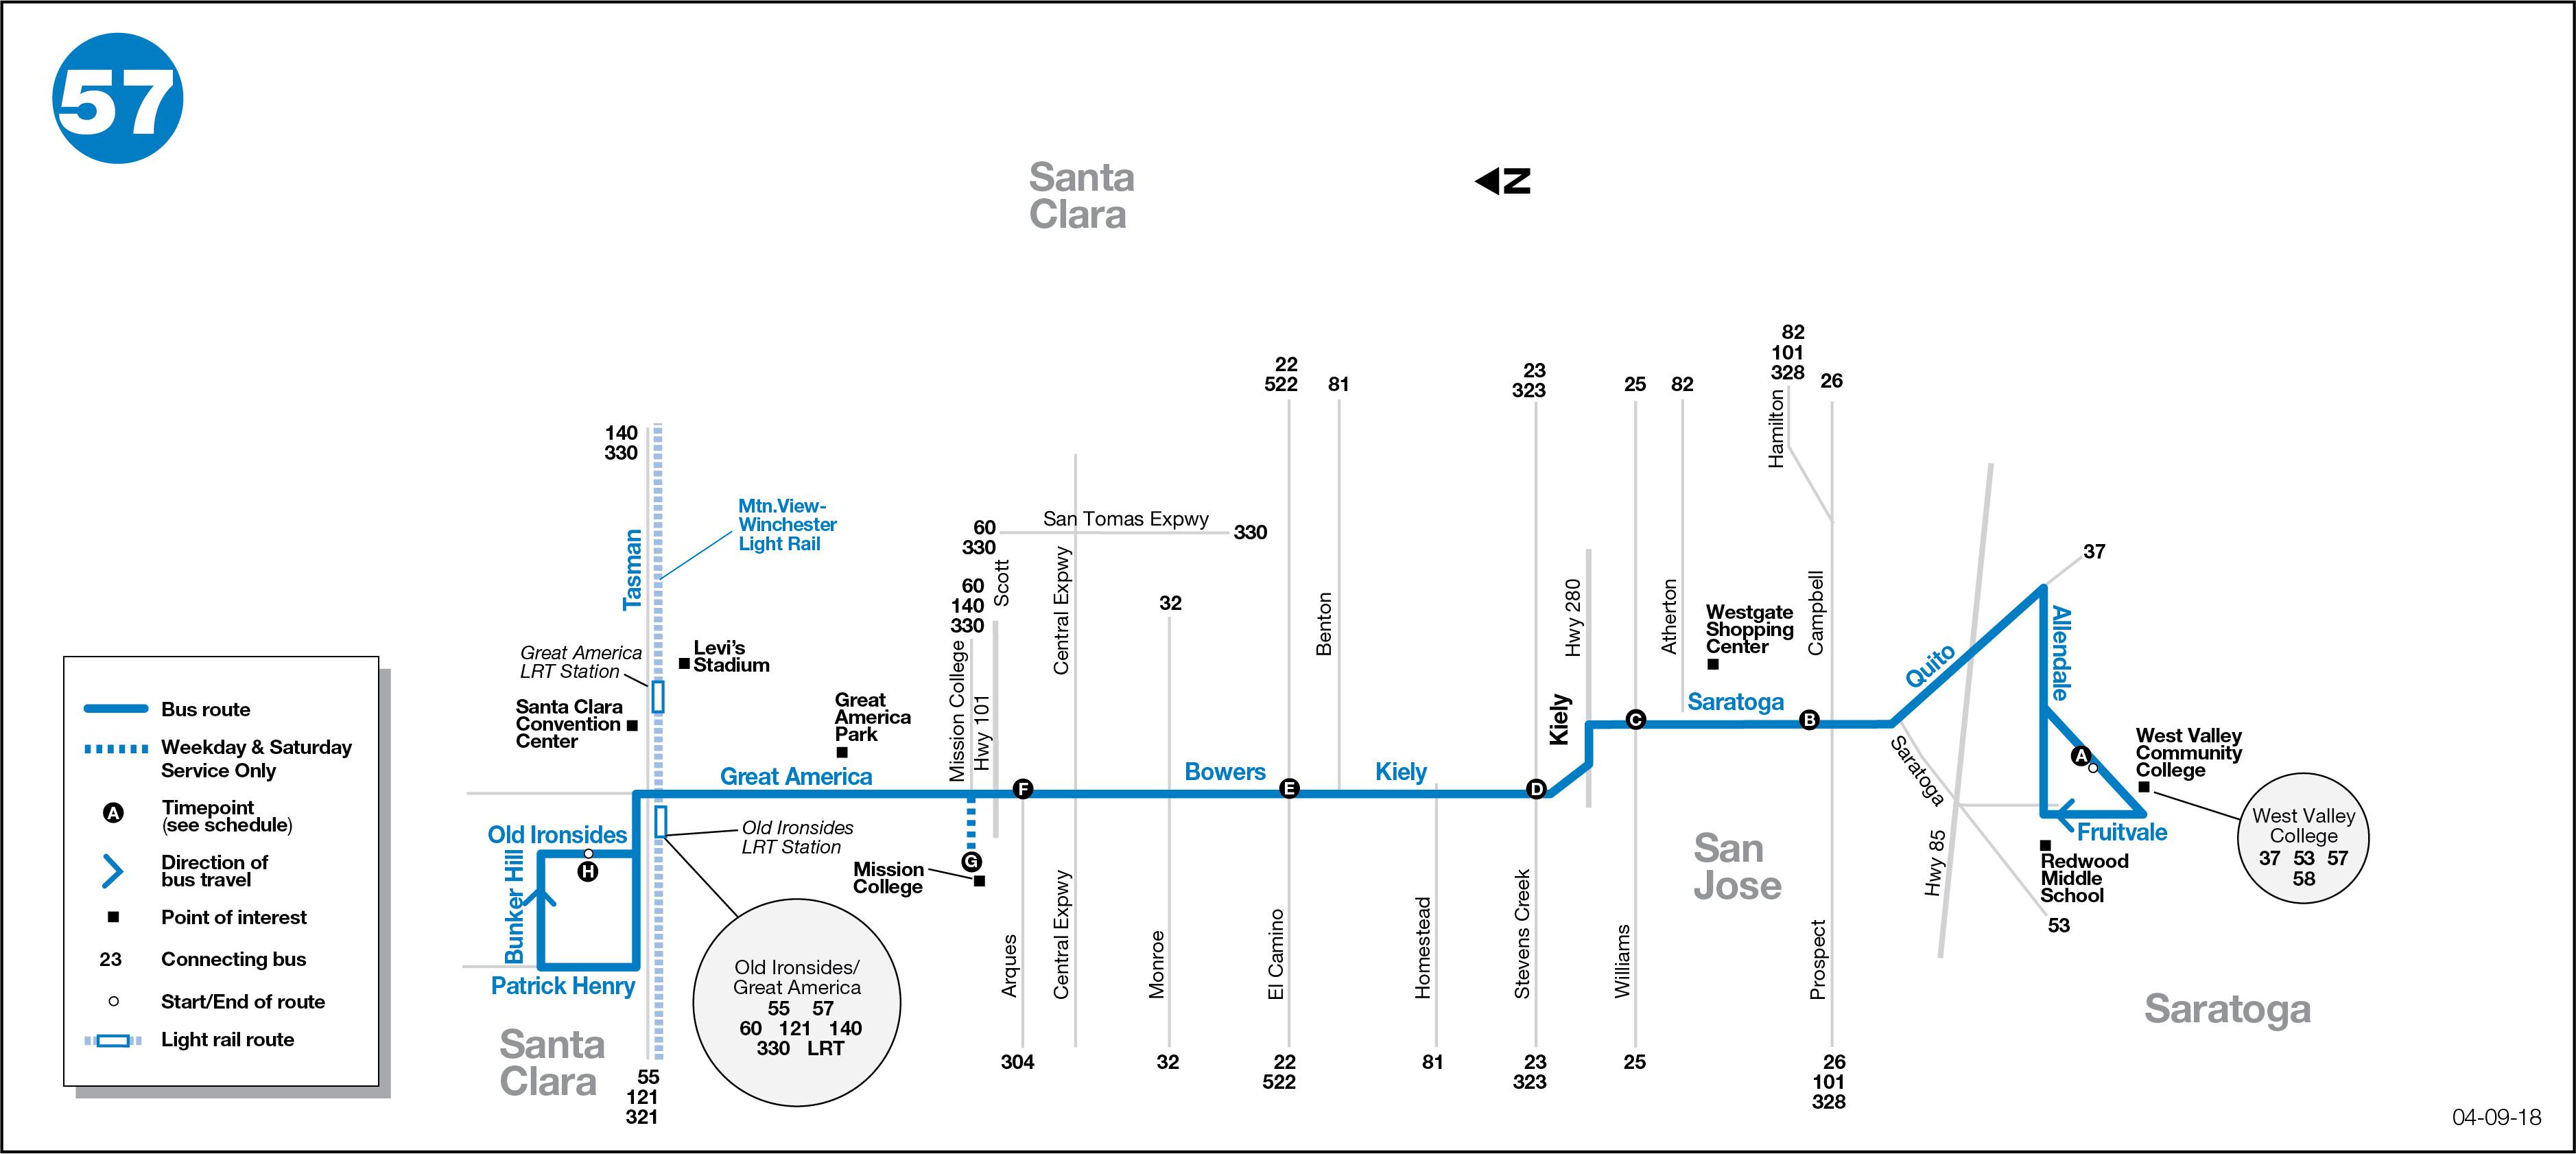 57 Bus Route Vta Sf Bay Transit